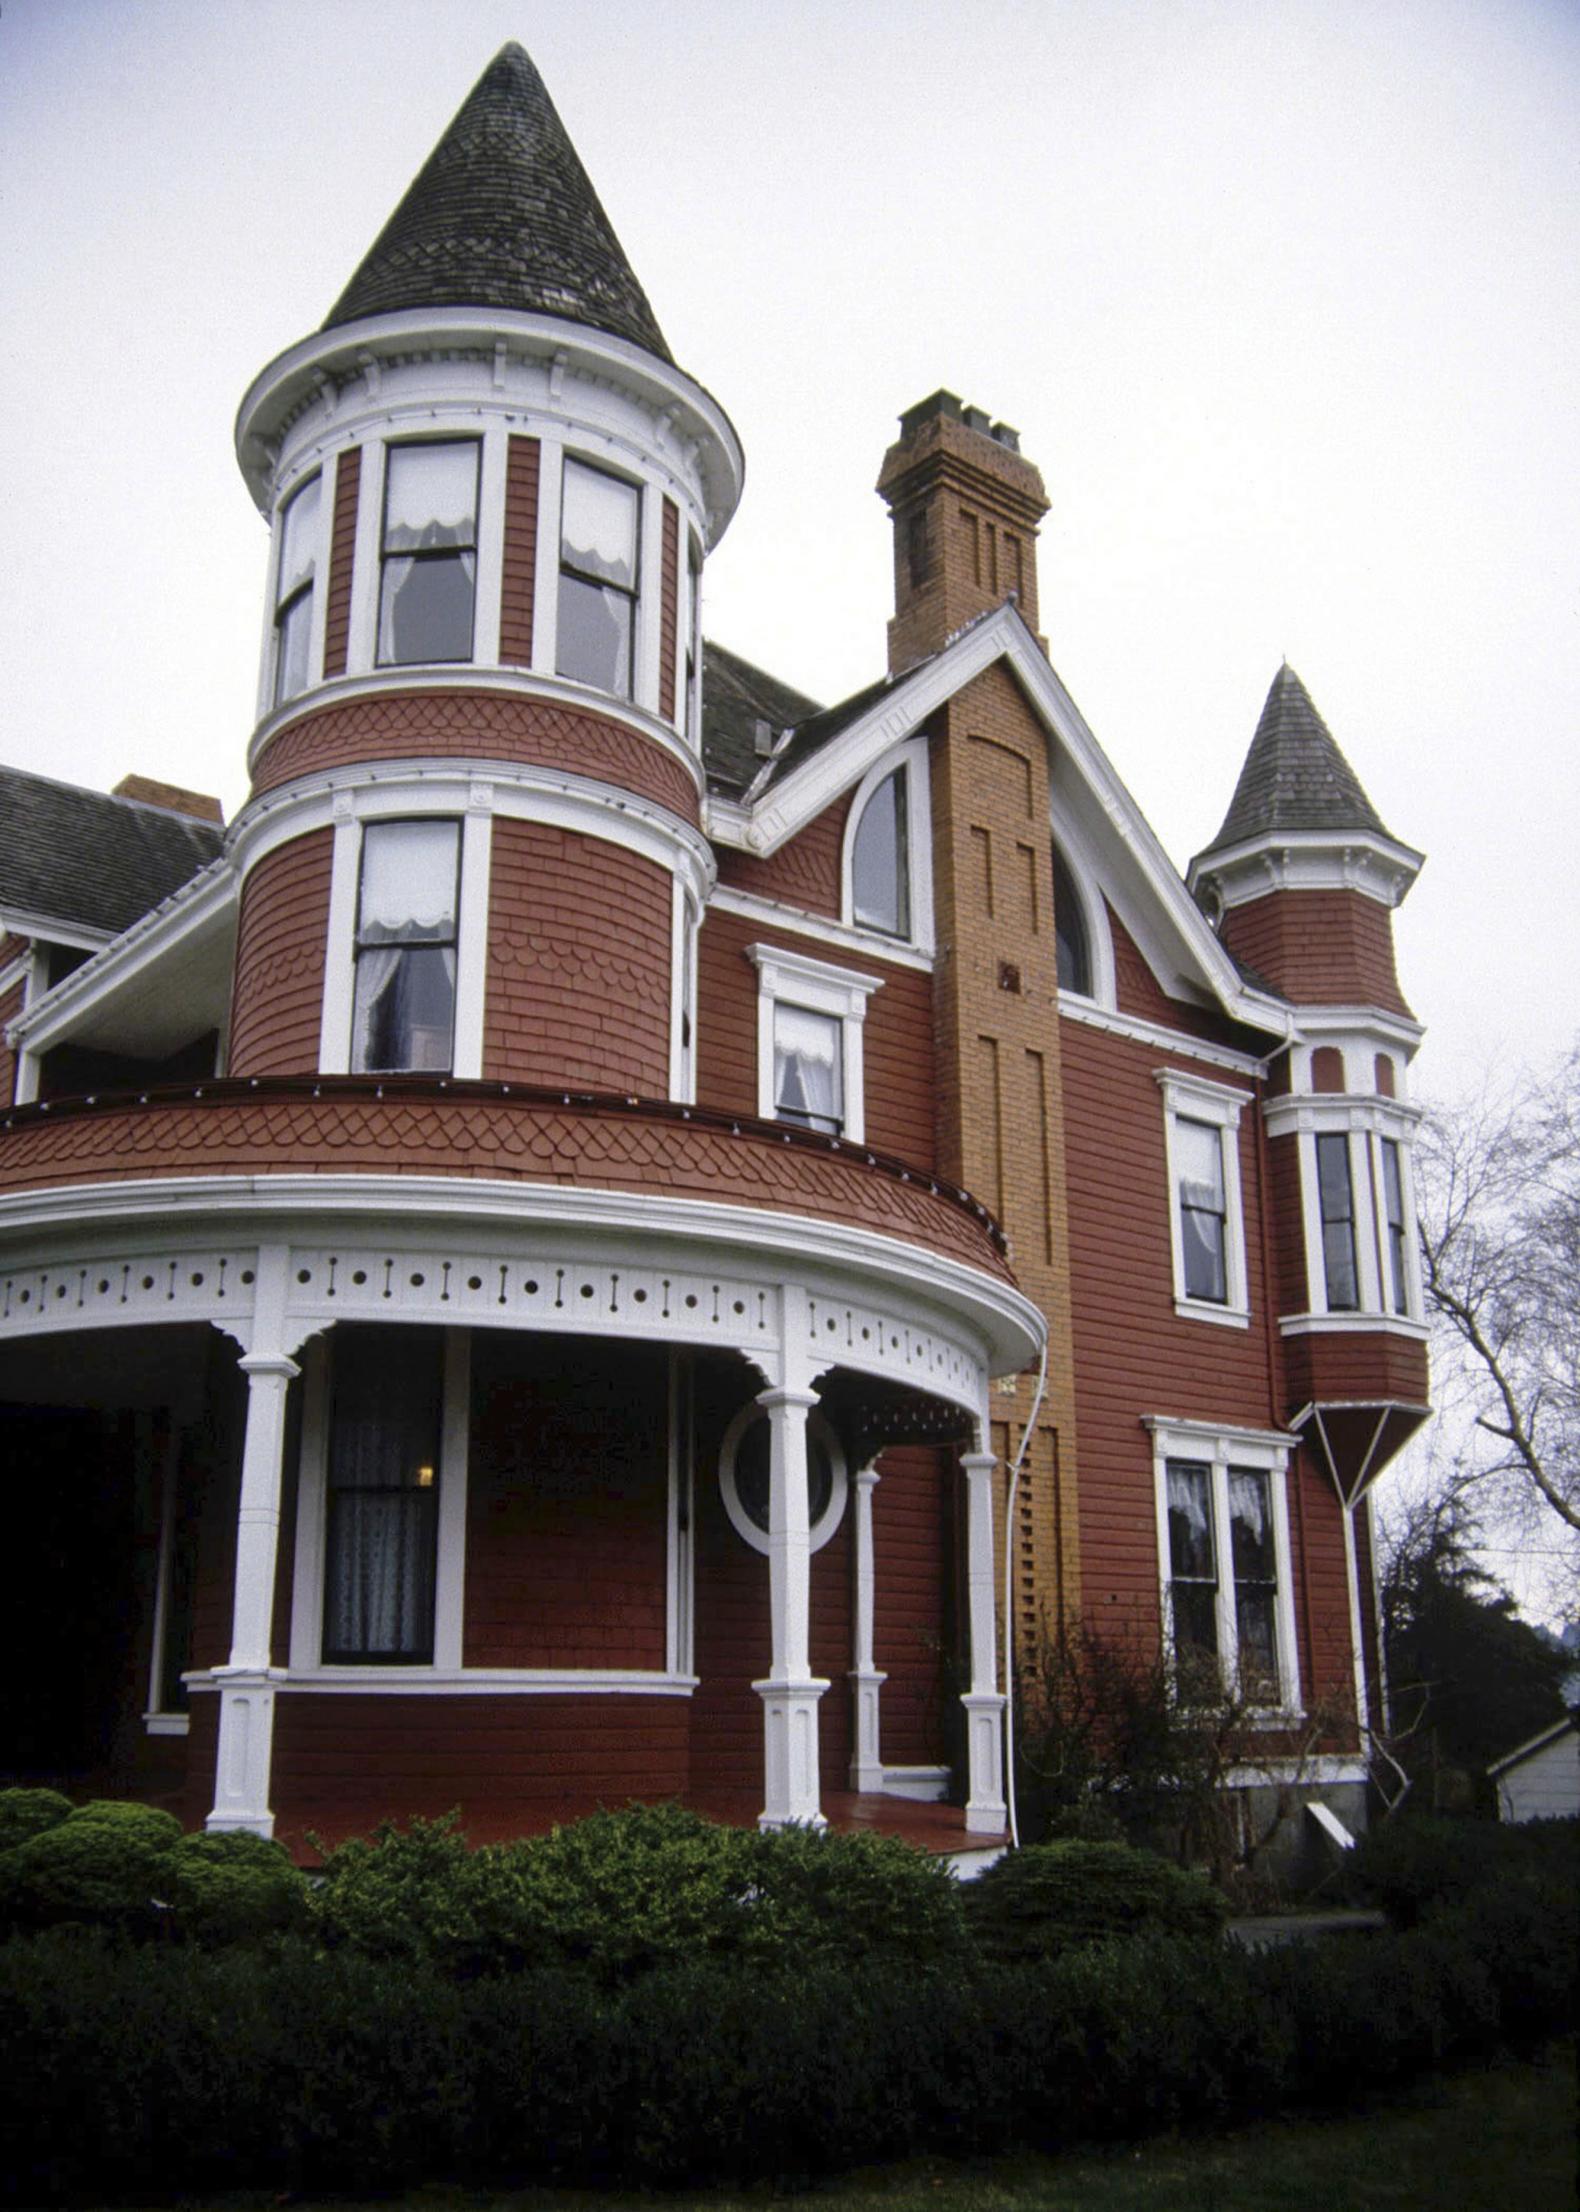 Df5411 esquemas de color casa exteriores con persianas negras - Df5411 Esquemas De Color Casa Exteriores Con Persianas Negras 7